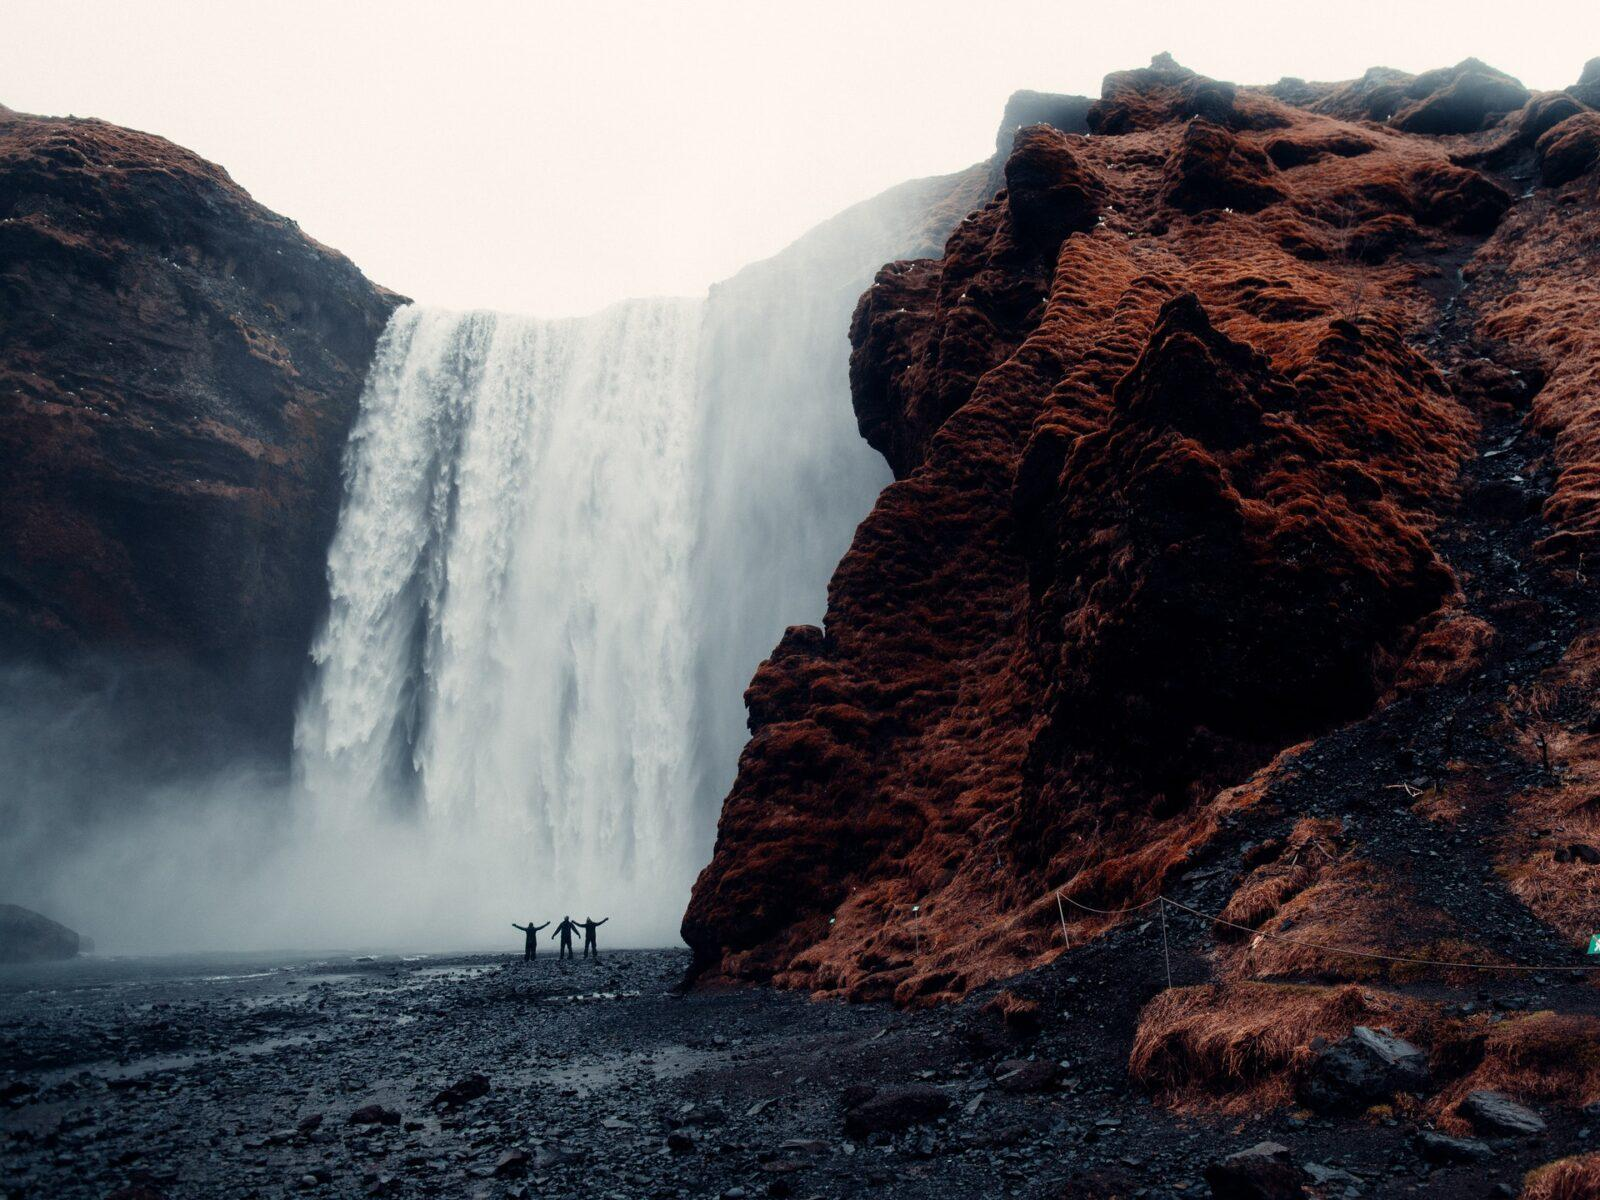 pexels sam kolder 2387873 1536x1152 - Guide Morocco Tours